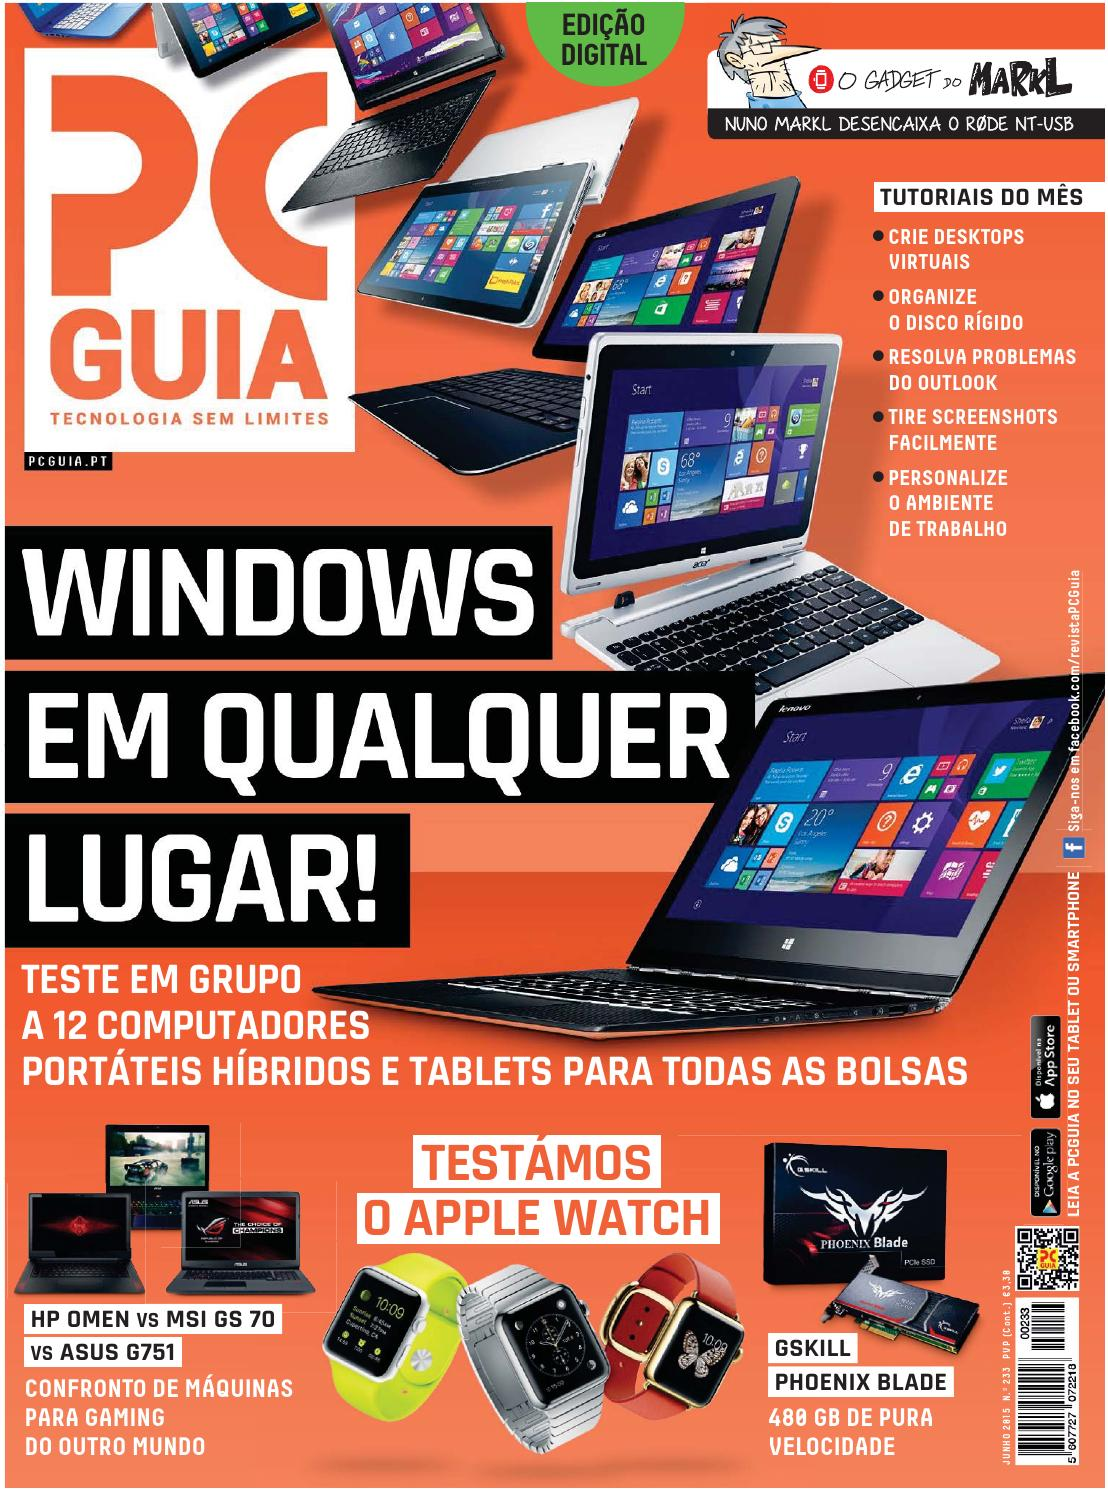 Pcguiajuhno2015 2 by Pedro Silva - issuu 9a5cf1c602